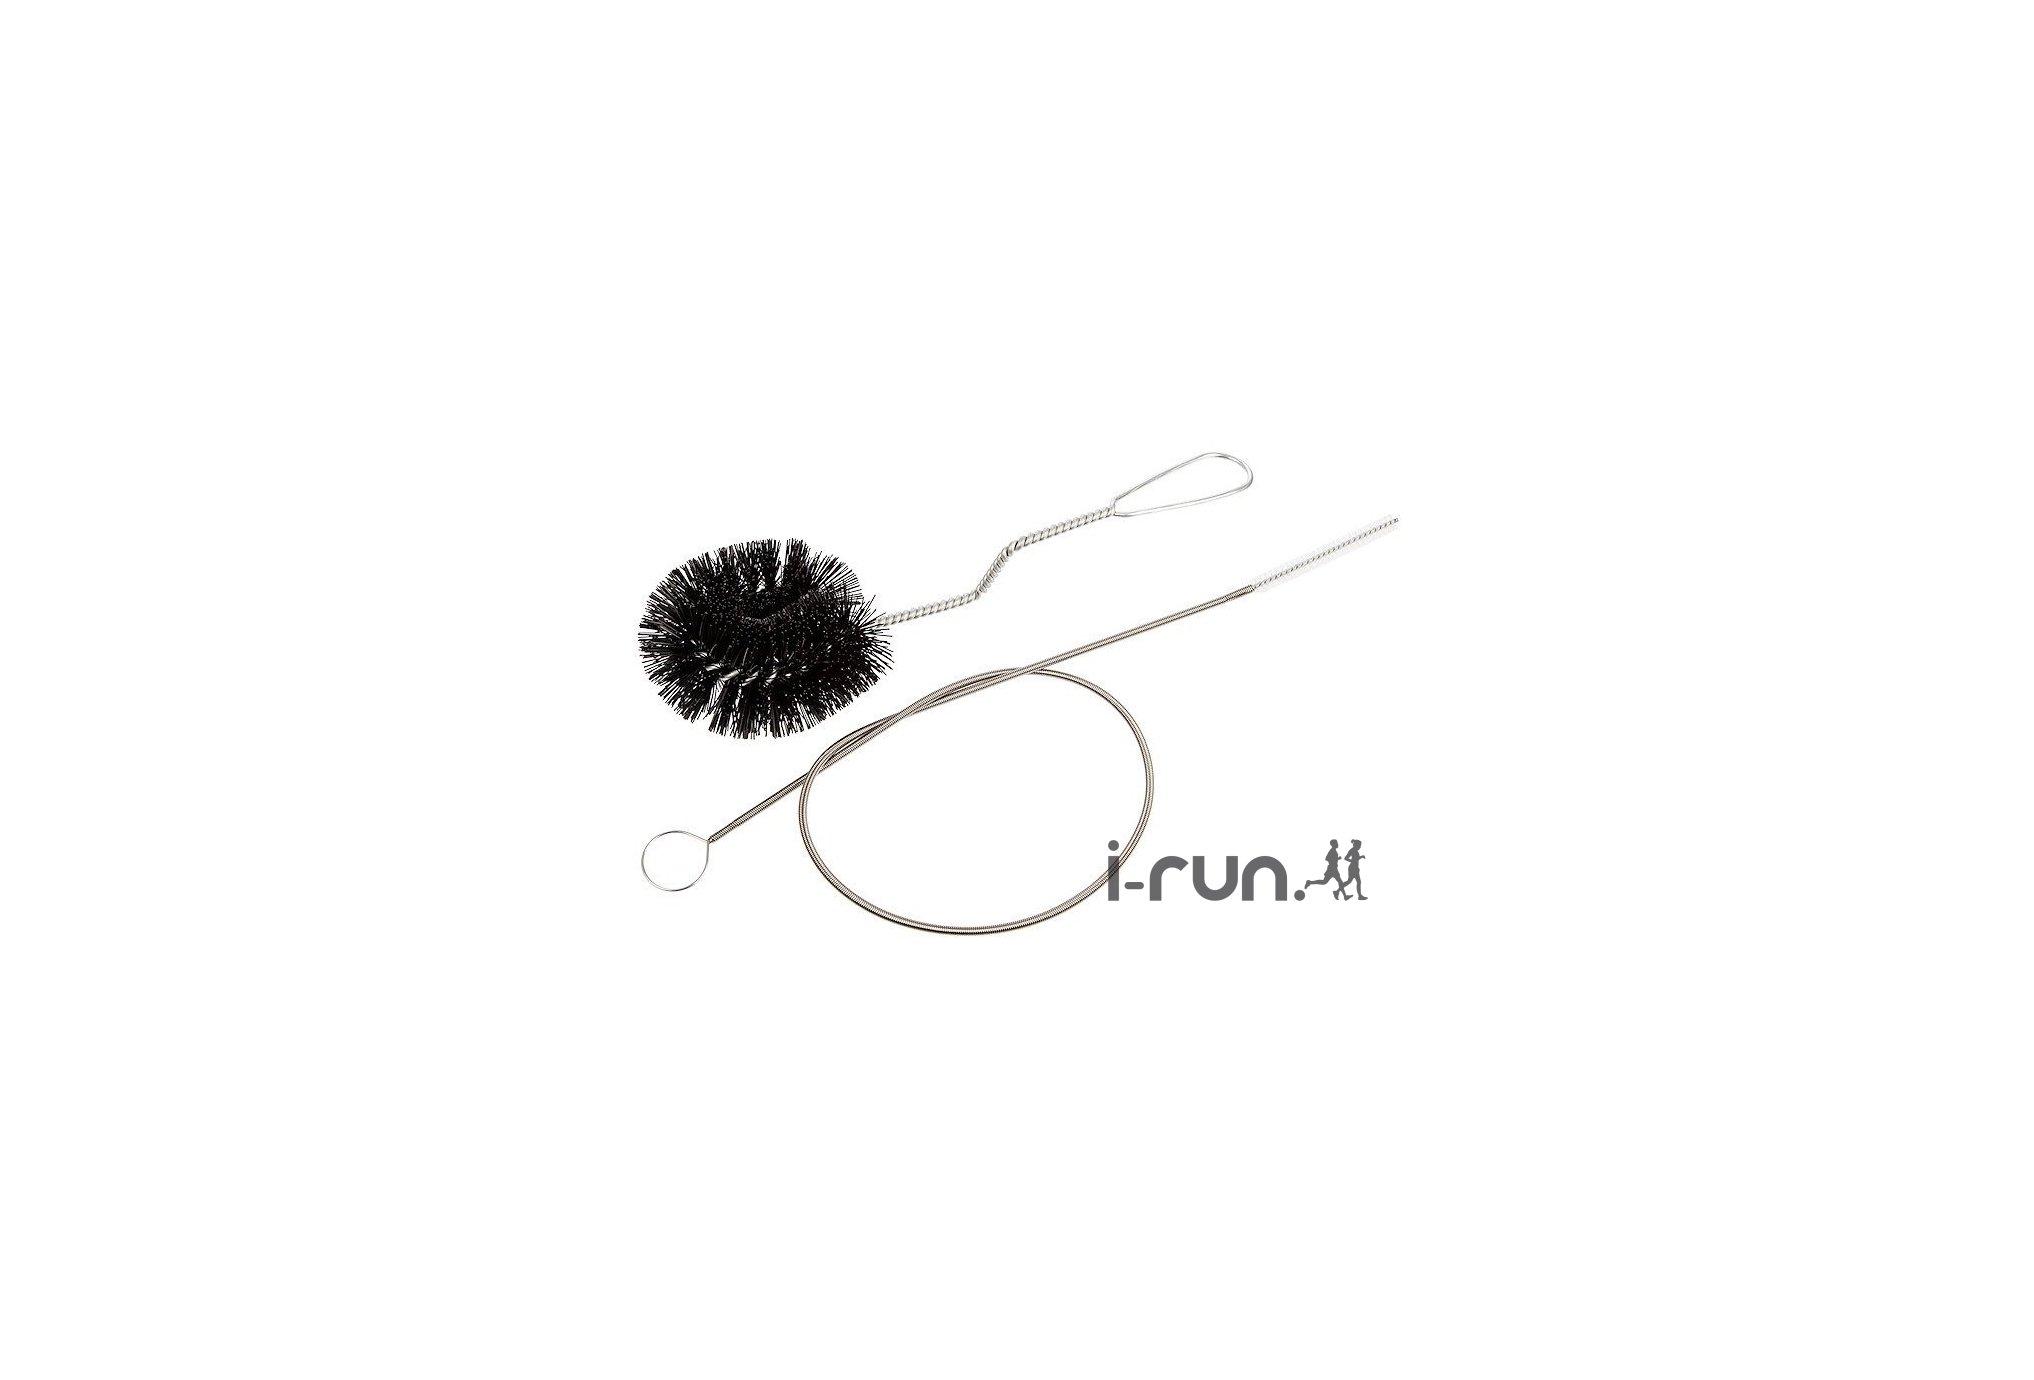 Camelbak Goupillon Cleaning Brush Kit Sac hydratation / Gourde